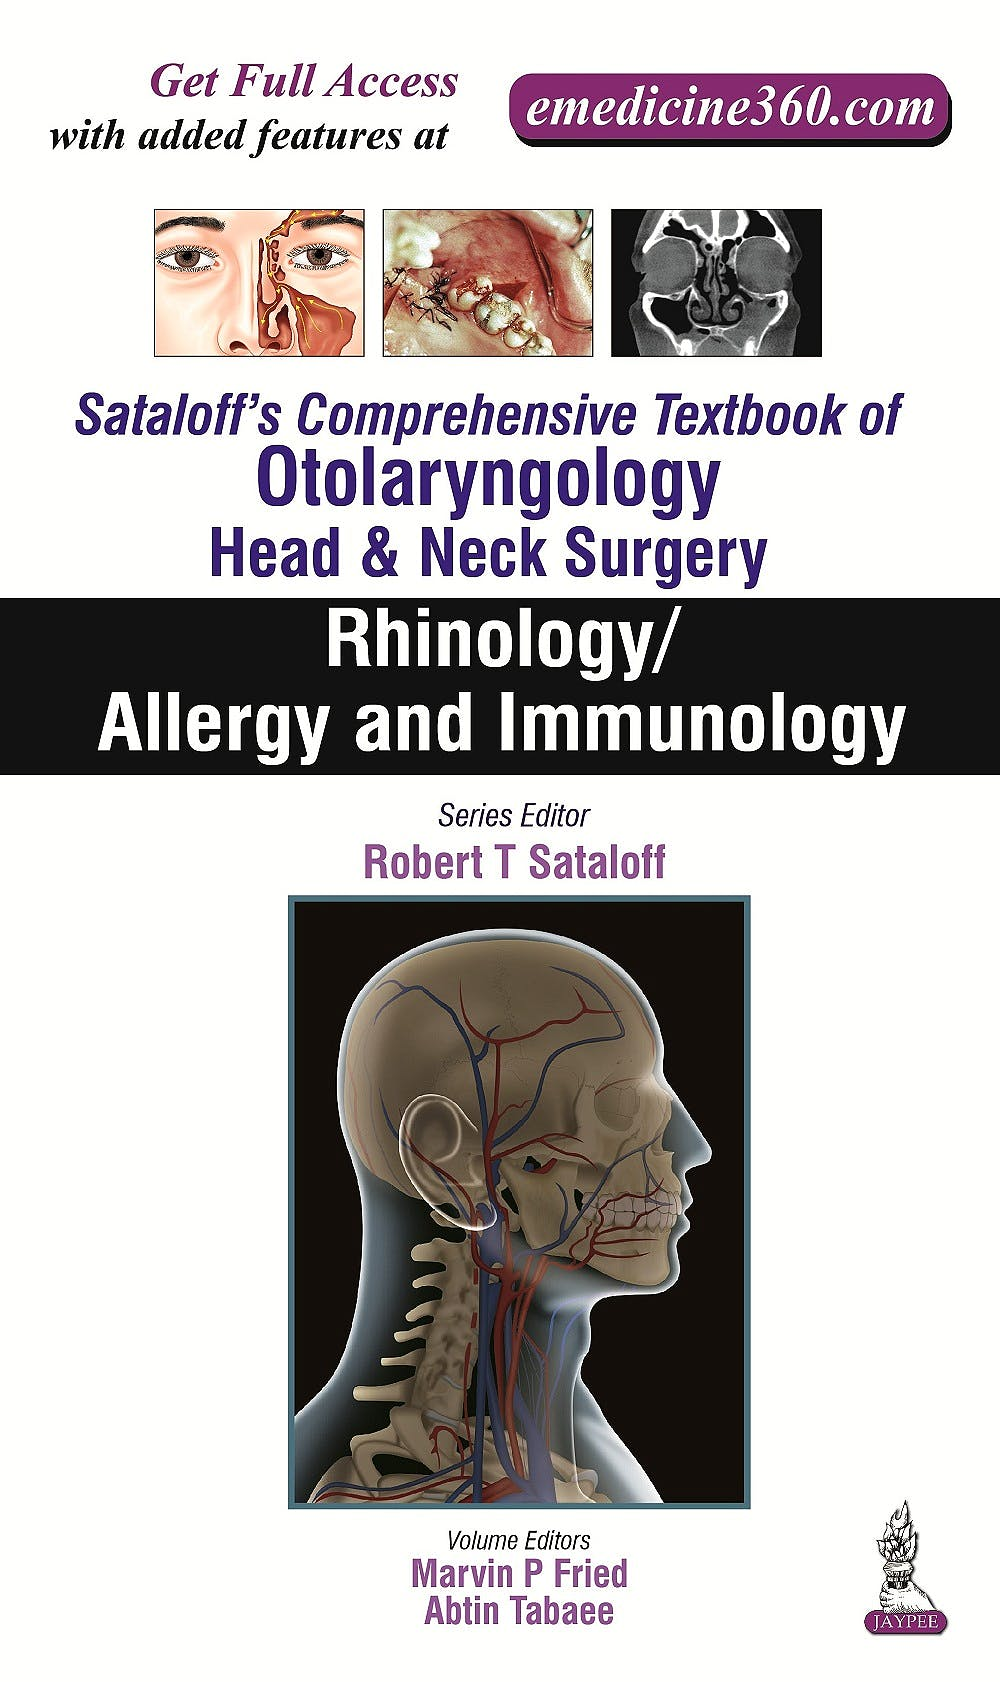 Portada del libro 9789351524564 Sataloff's Comprehensive Textbook of Otolaryngology: Head & Neck Surgery Vol. 2: Rhinology/Allergy and Immunology